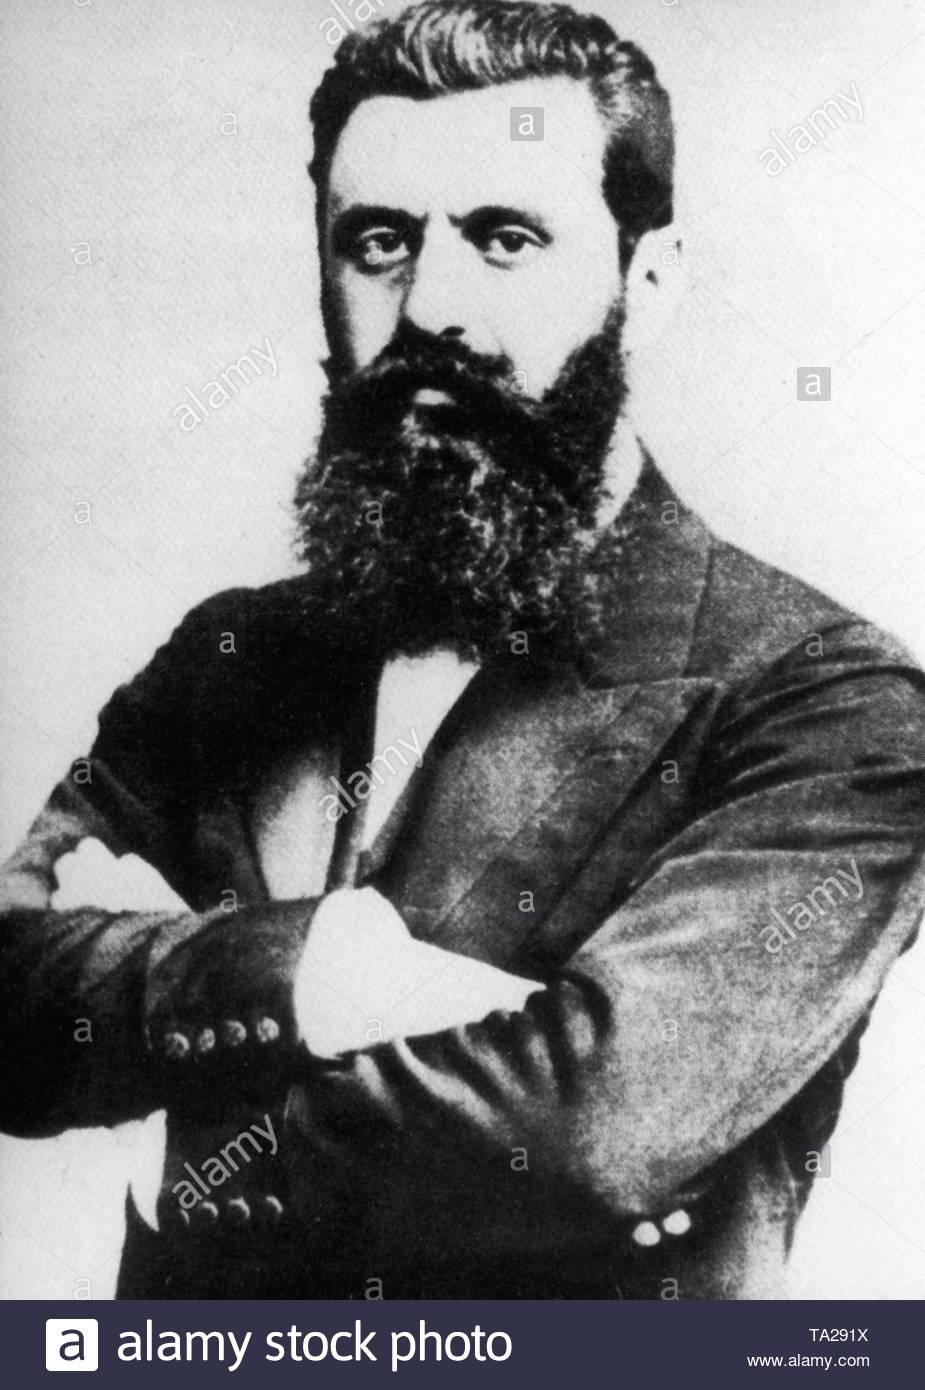 Theodor Herzl, Austrian writer, publicist, journalist and Zionist politician. - Stock Image